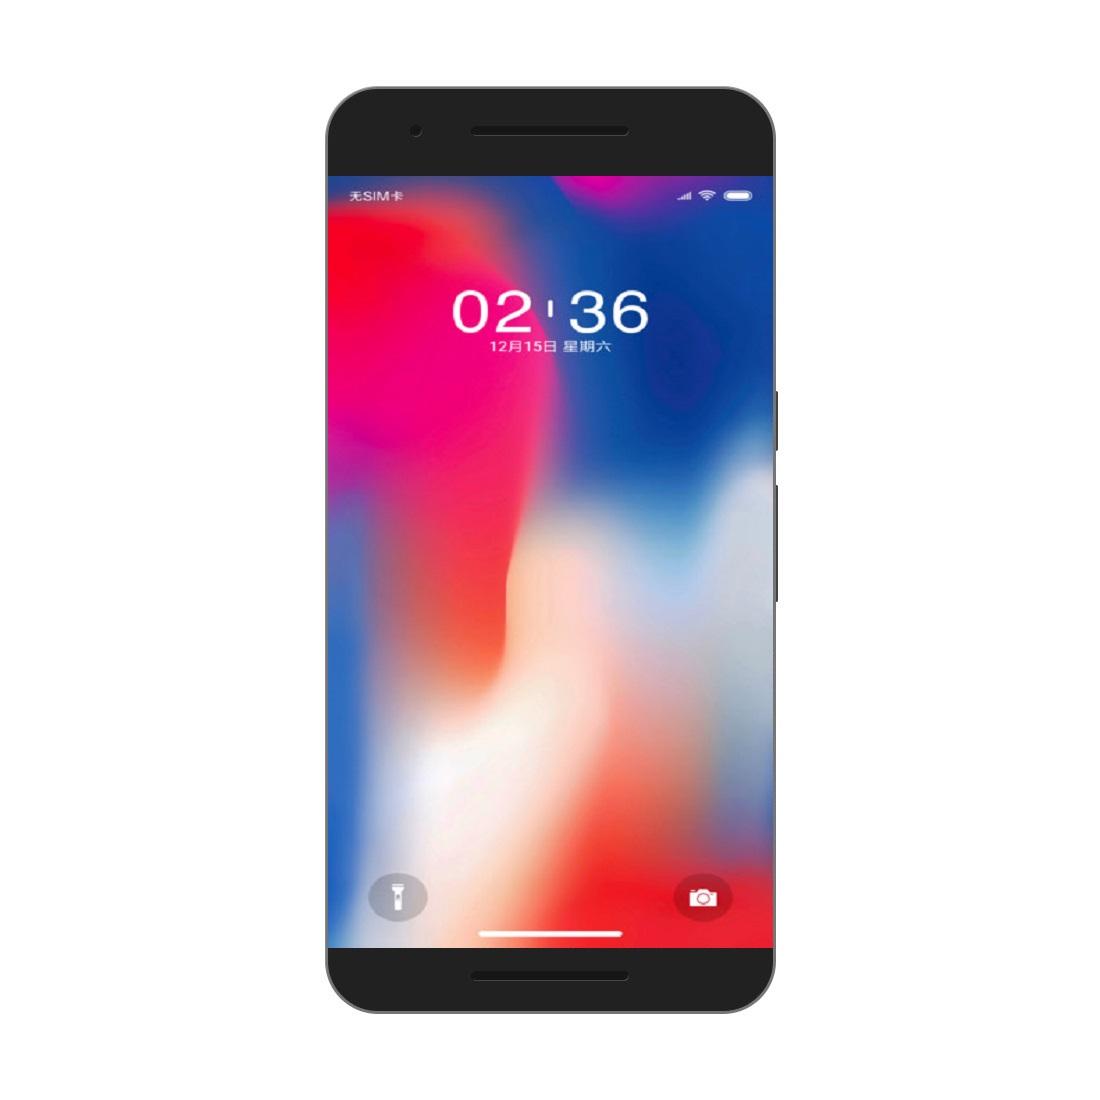 XIAOMI | iPhone Max XS